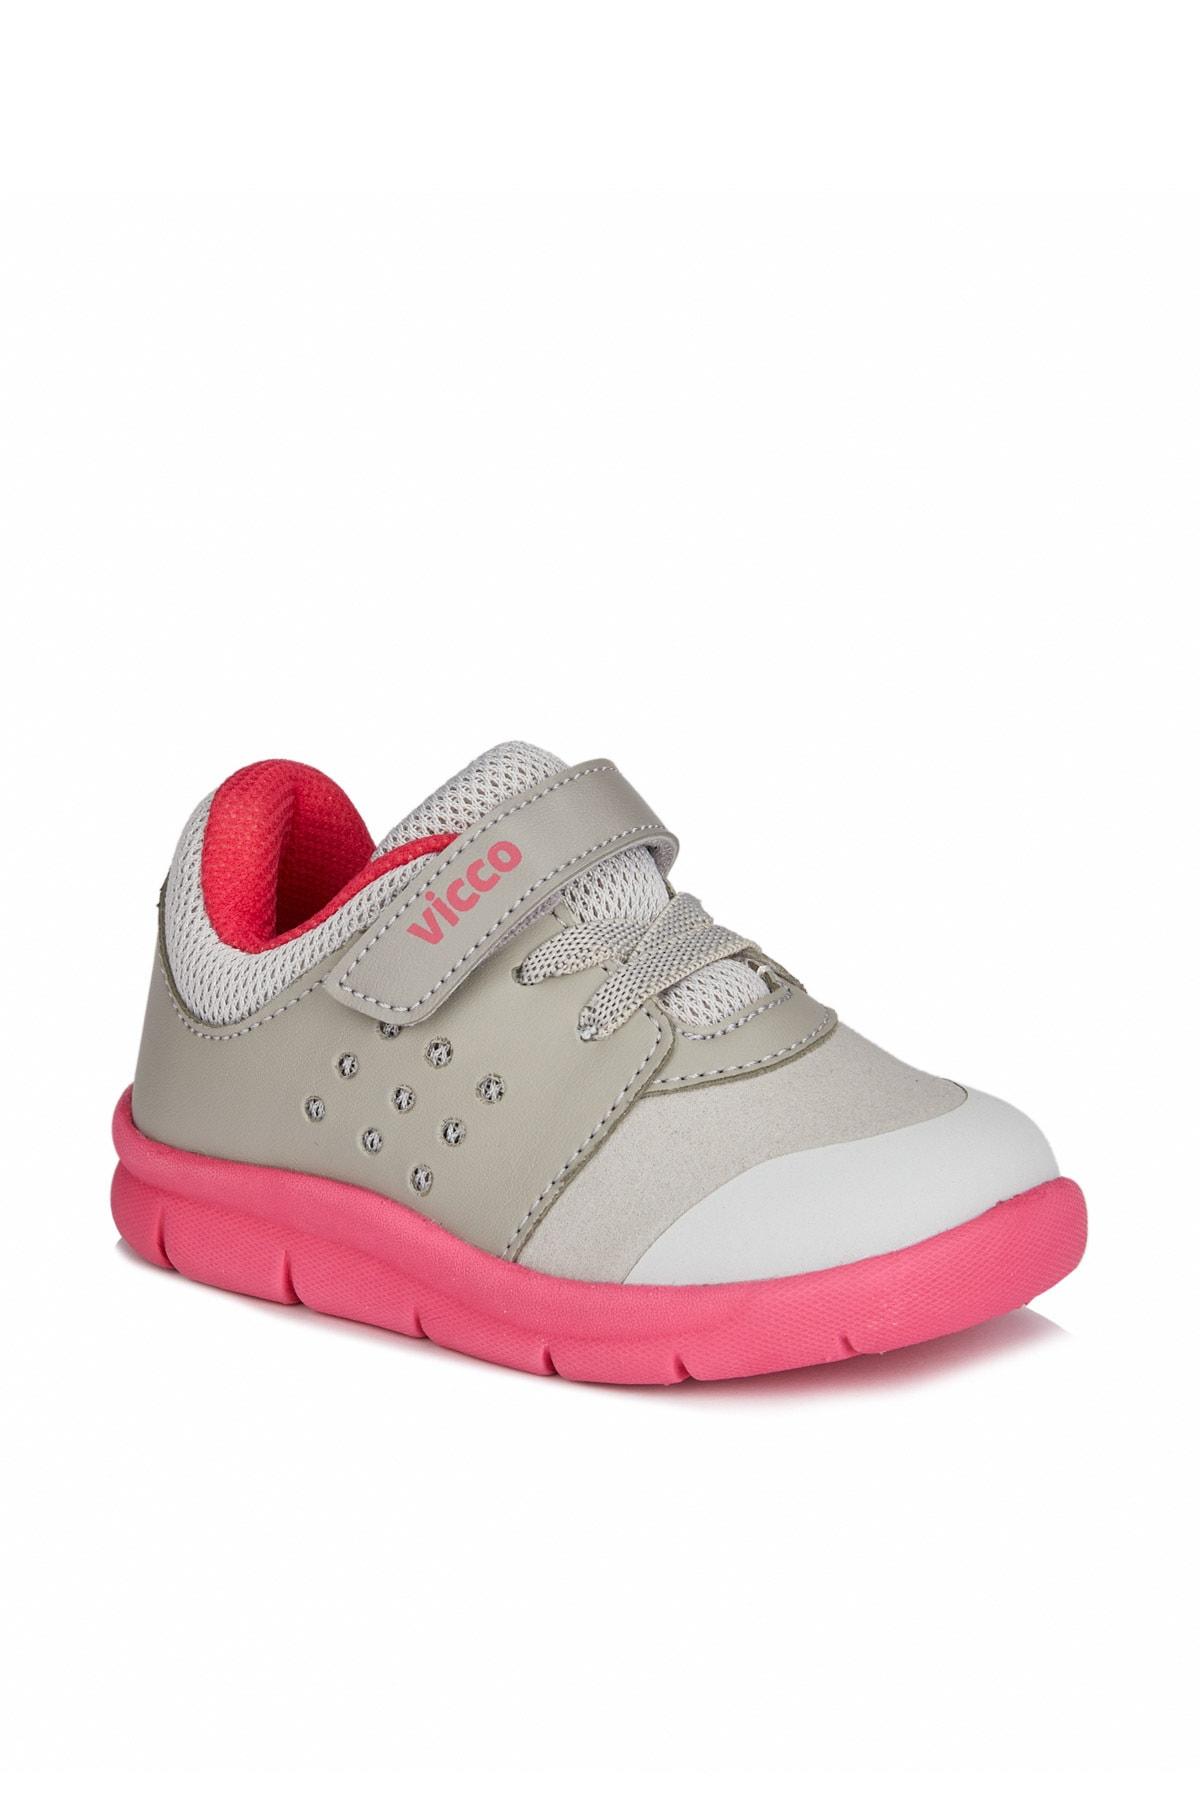 Vicco Mario Iı Kız Ilk Adım Gri/fuşya Spor Ayakkabı 1